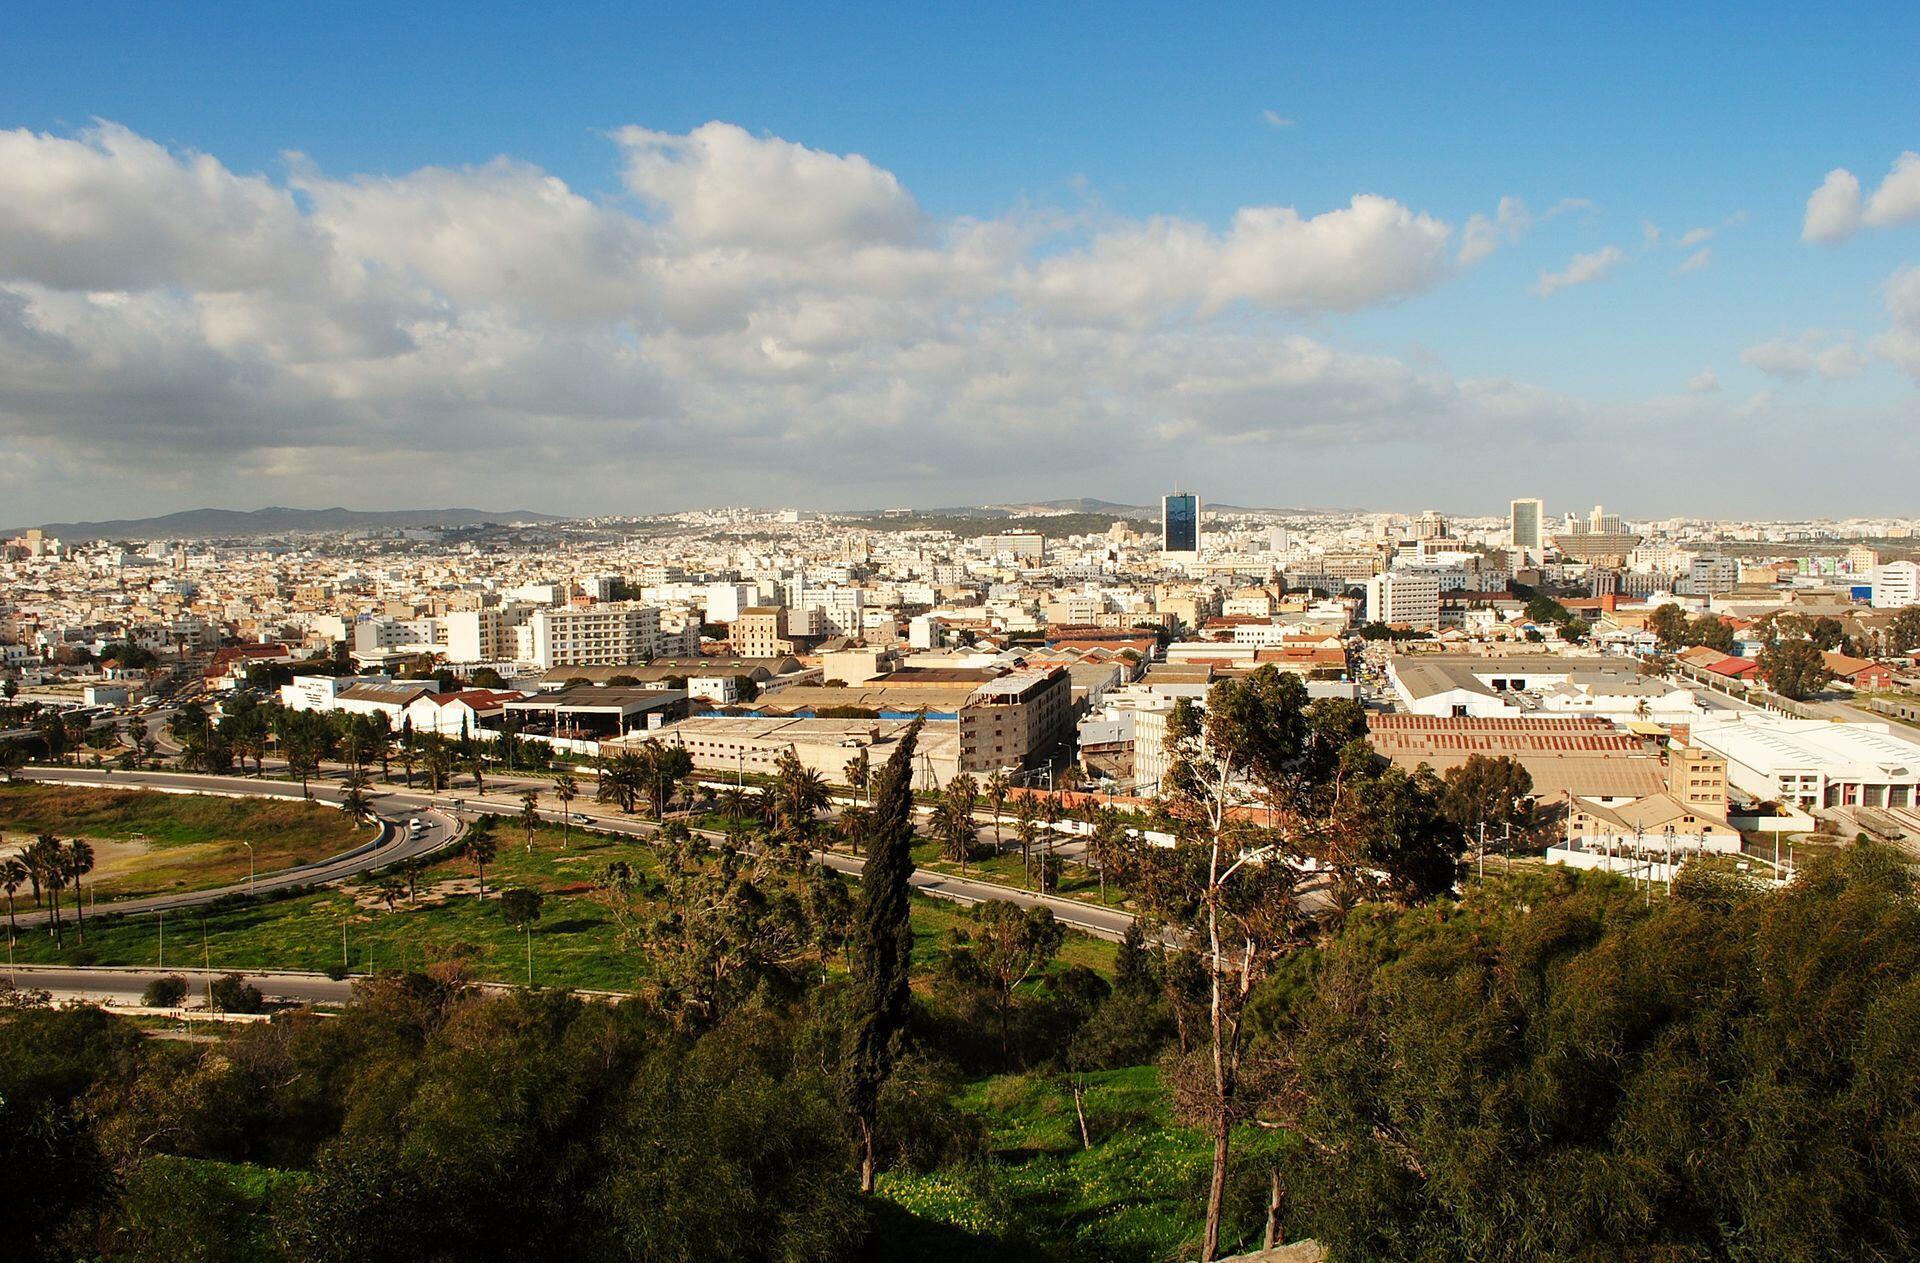 Vue de Tunis, Tunisie.